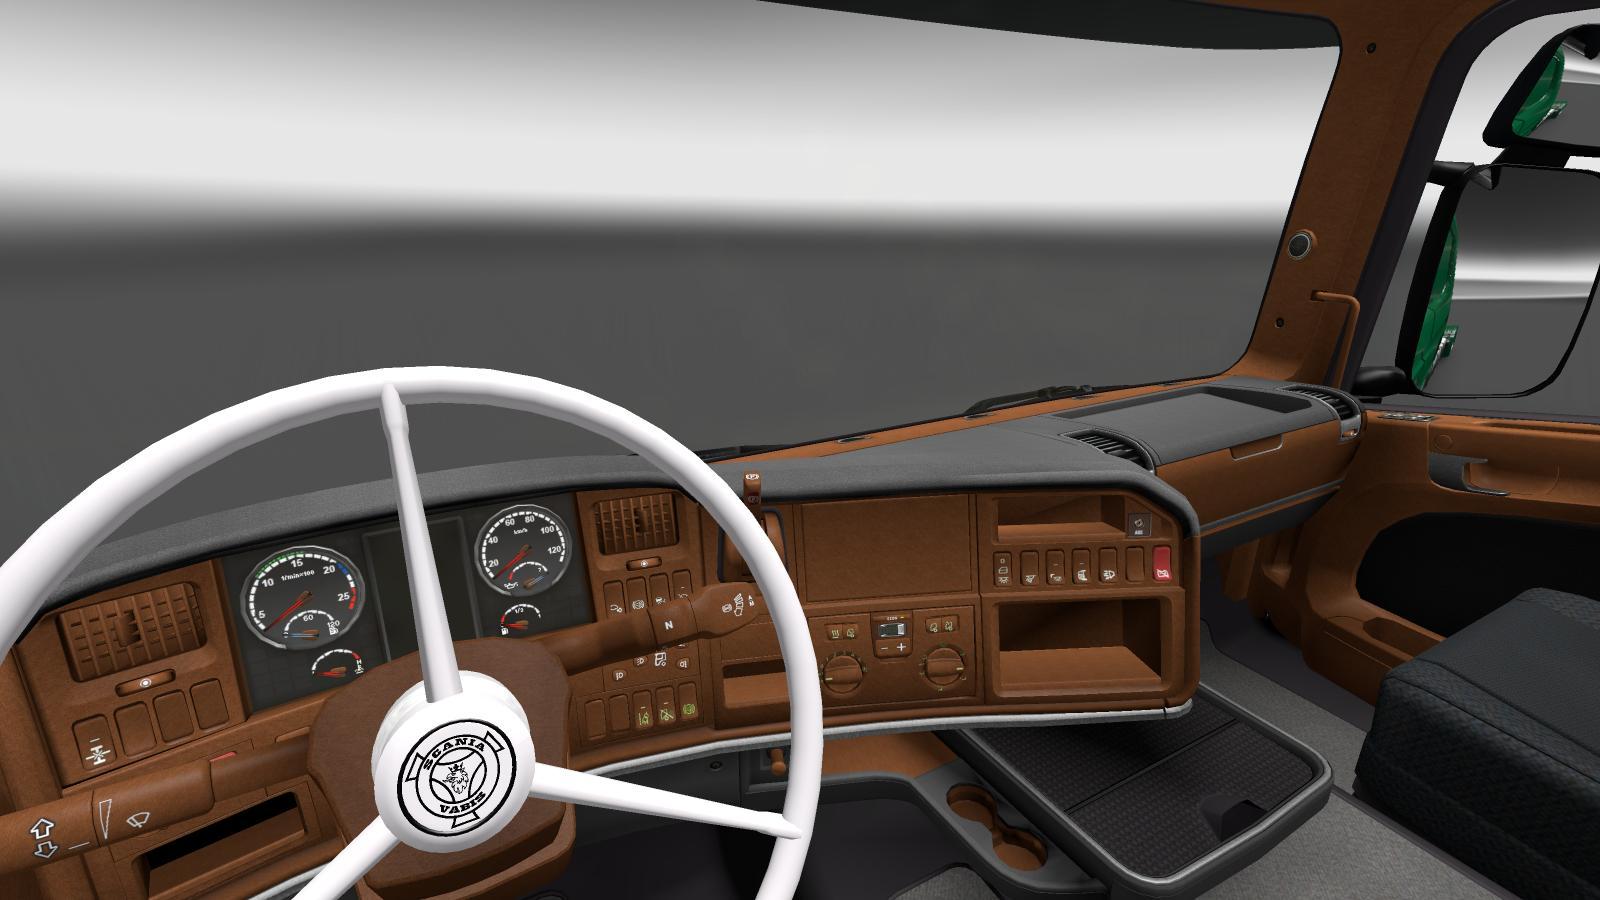 OTOOLES COMBO PACK BUSSBYGG TRAILER SKINS -Euro Truck